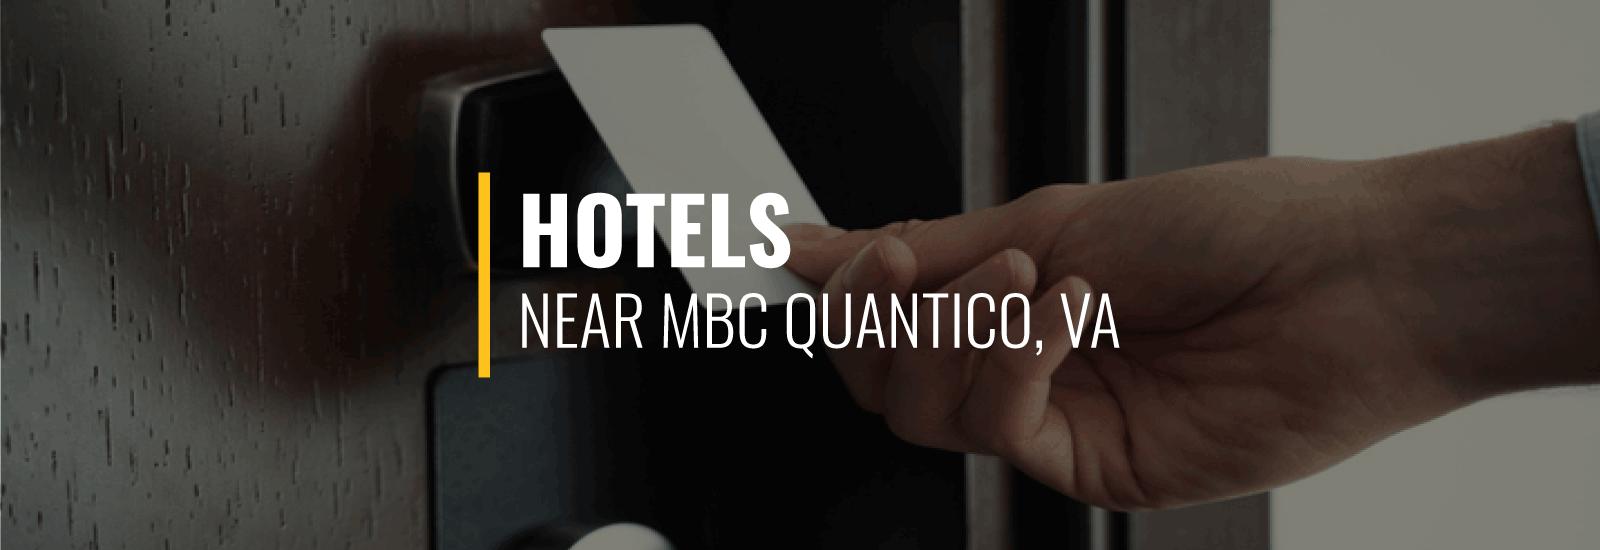 Hotels Near MCB Quantico